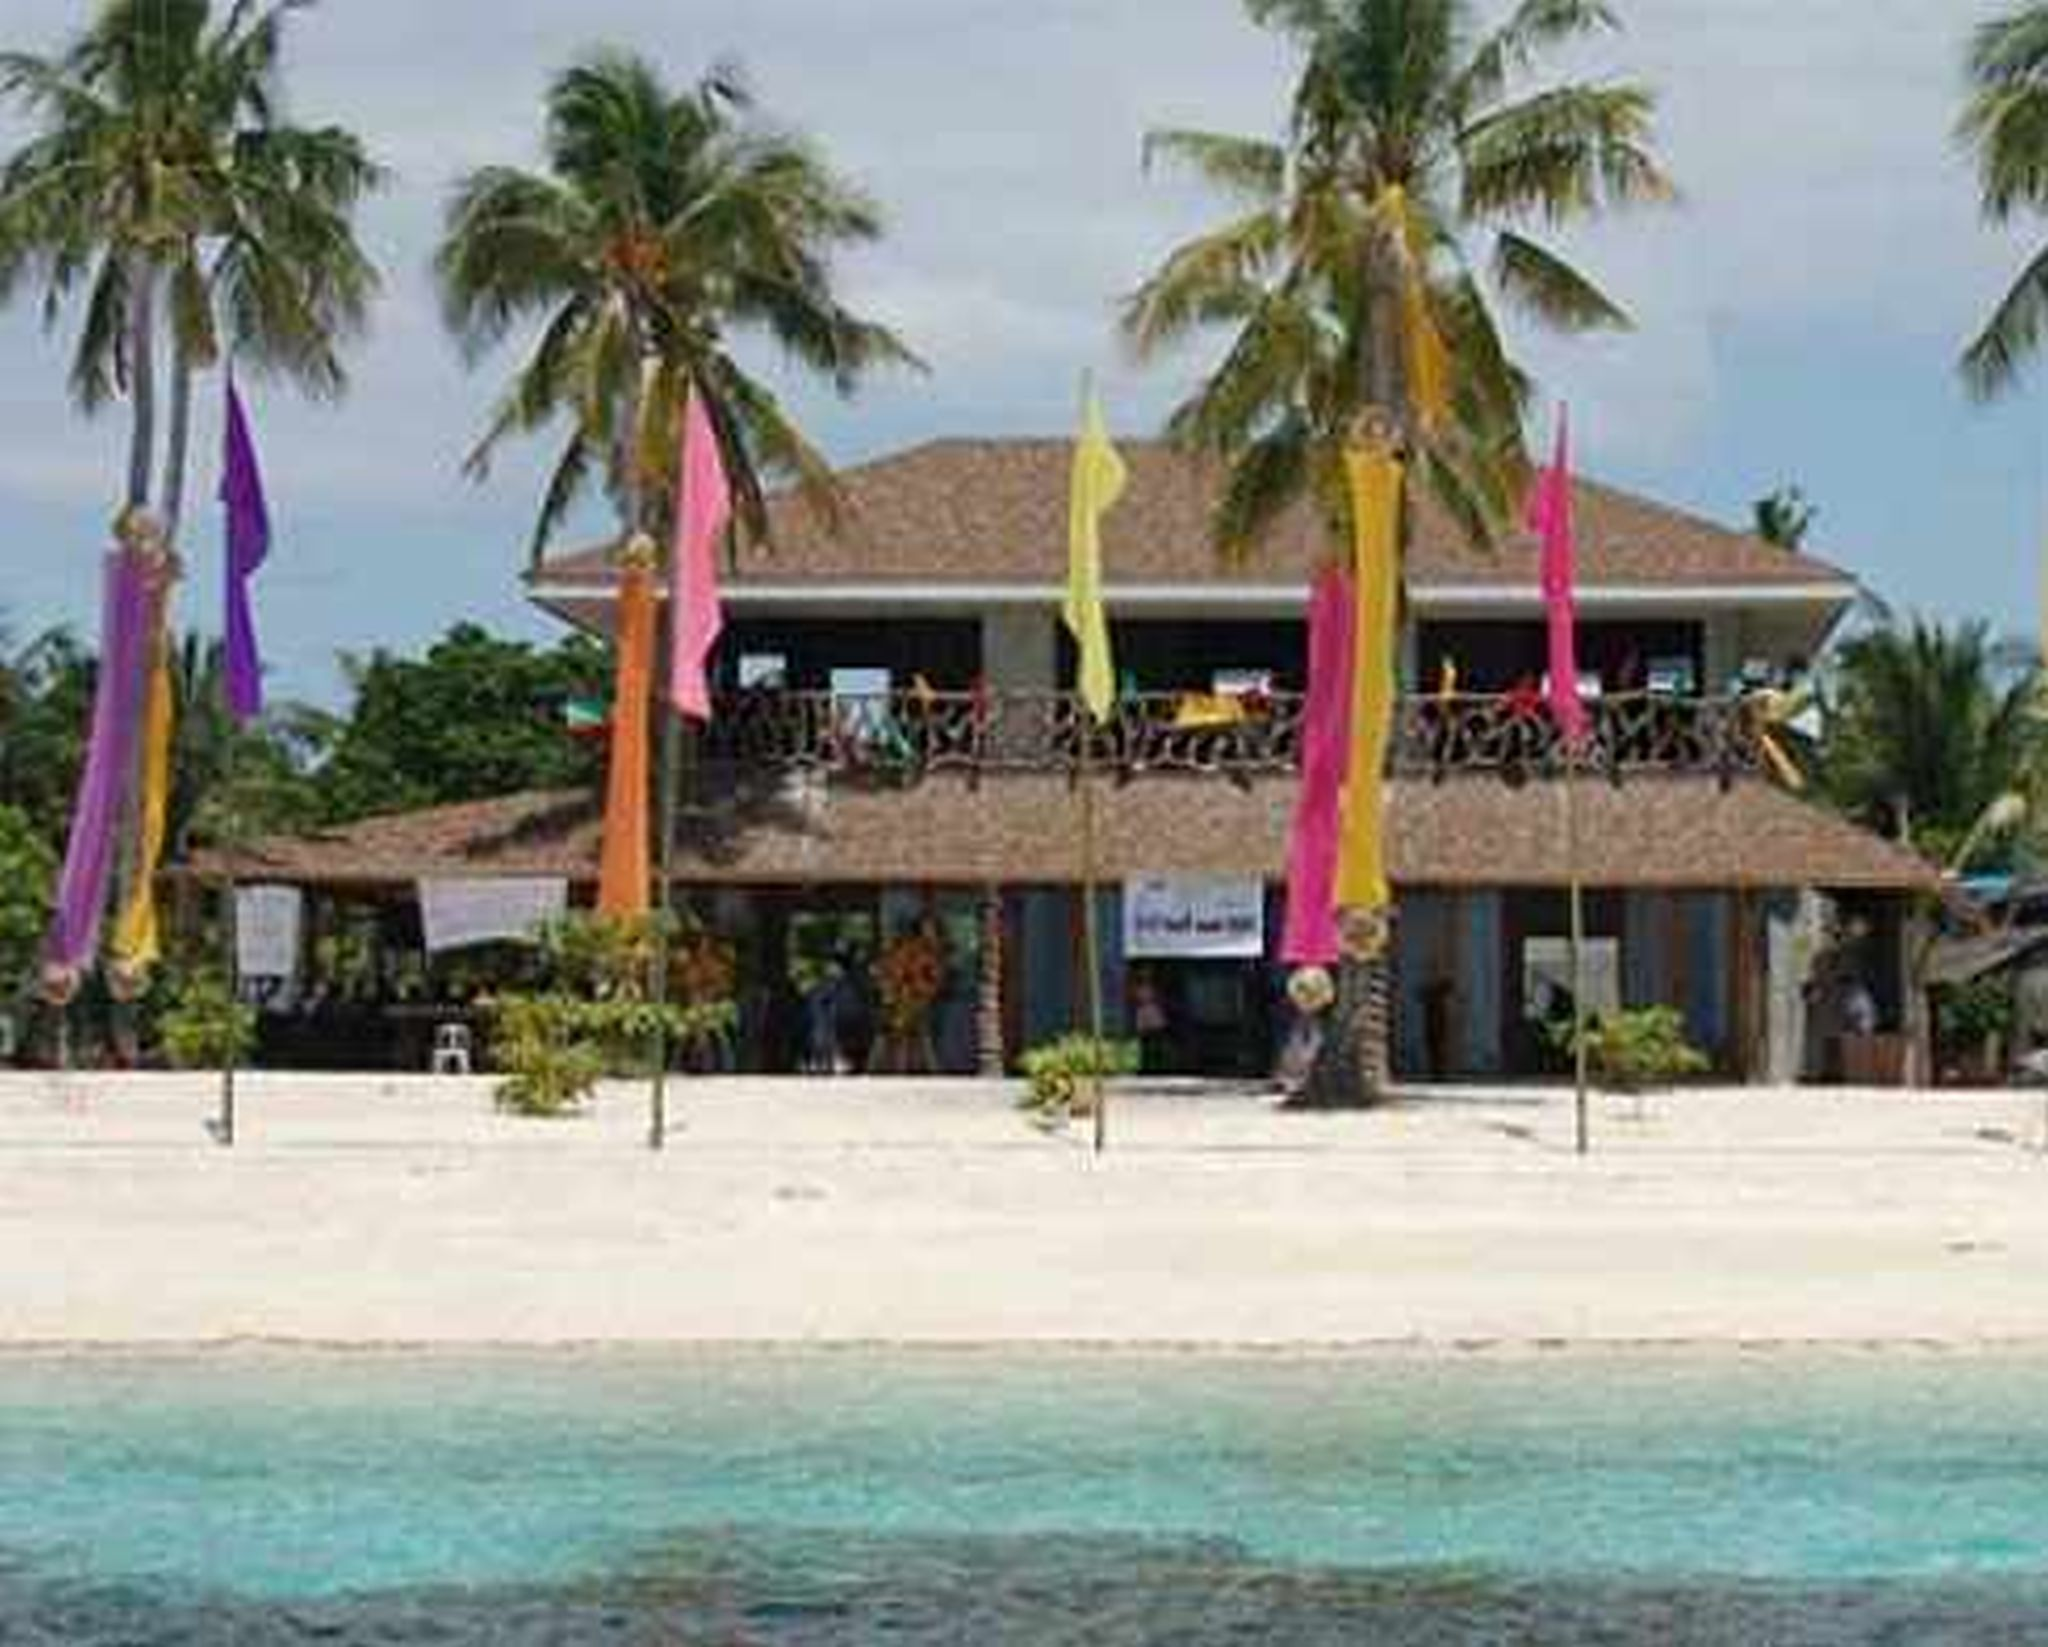 Malapascua Legend Water Sport And Resort, Lapu-Lapu City